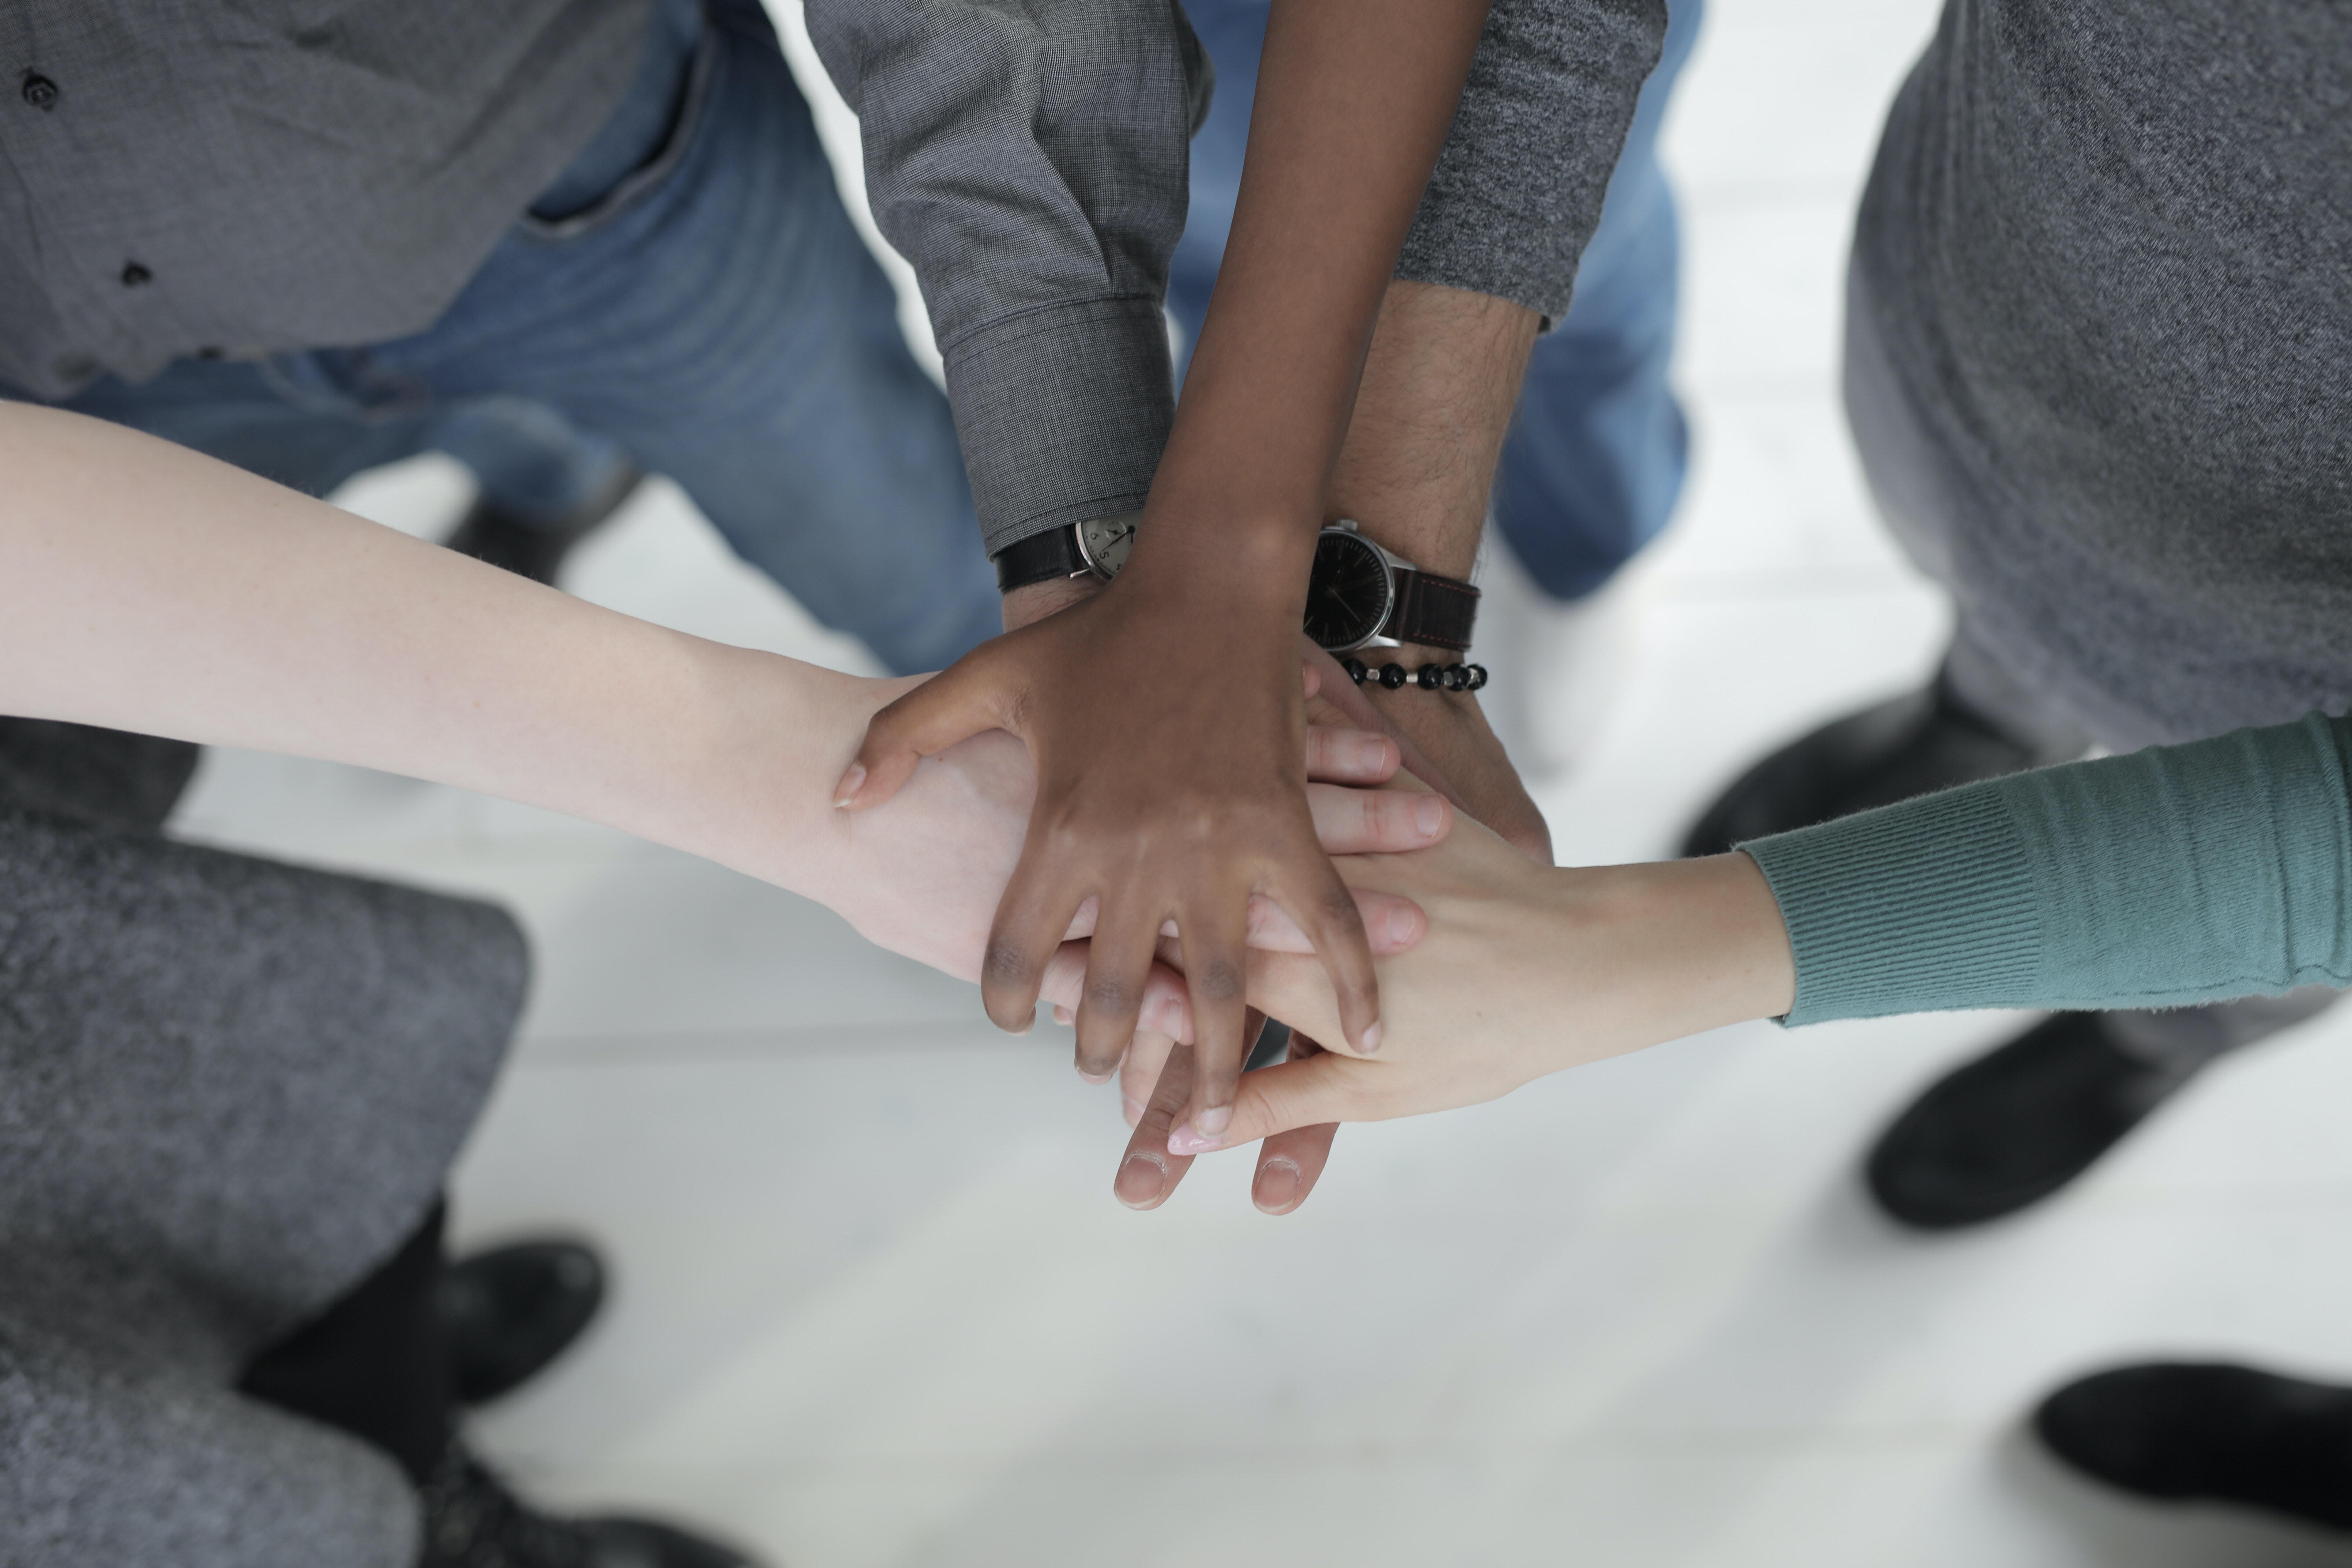 Multiethnic group shakes hands